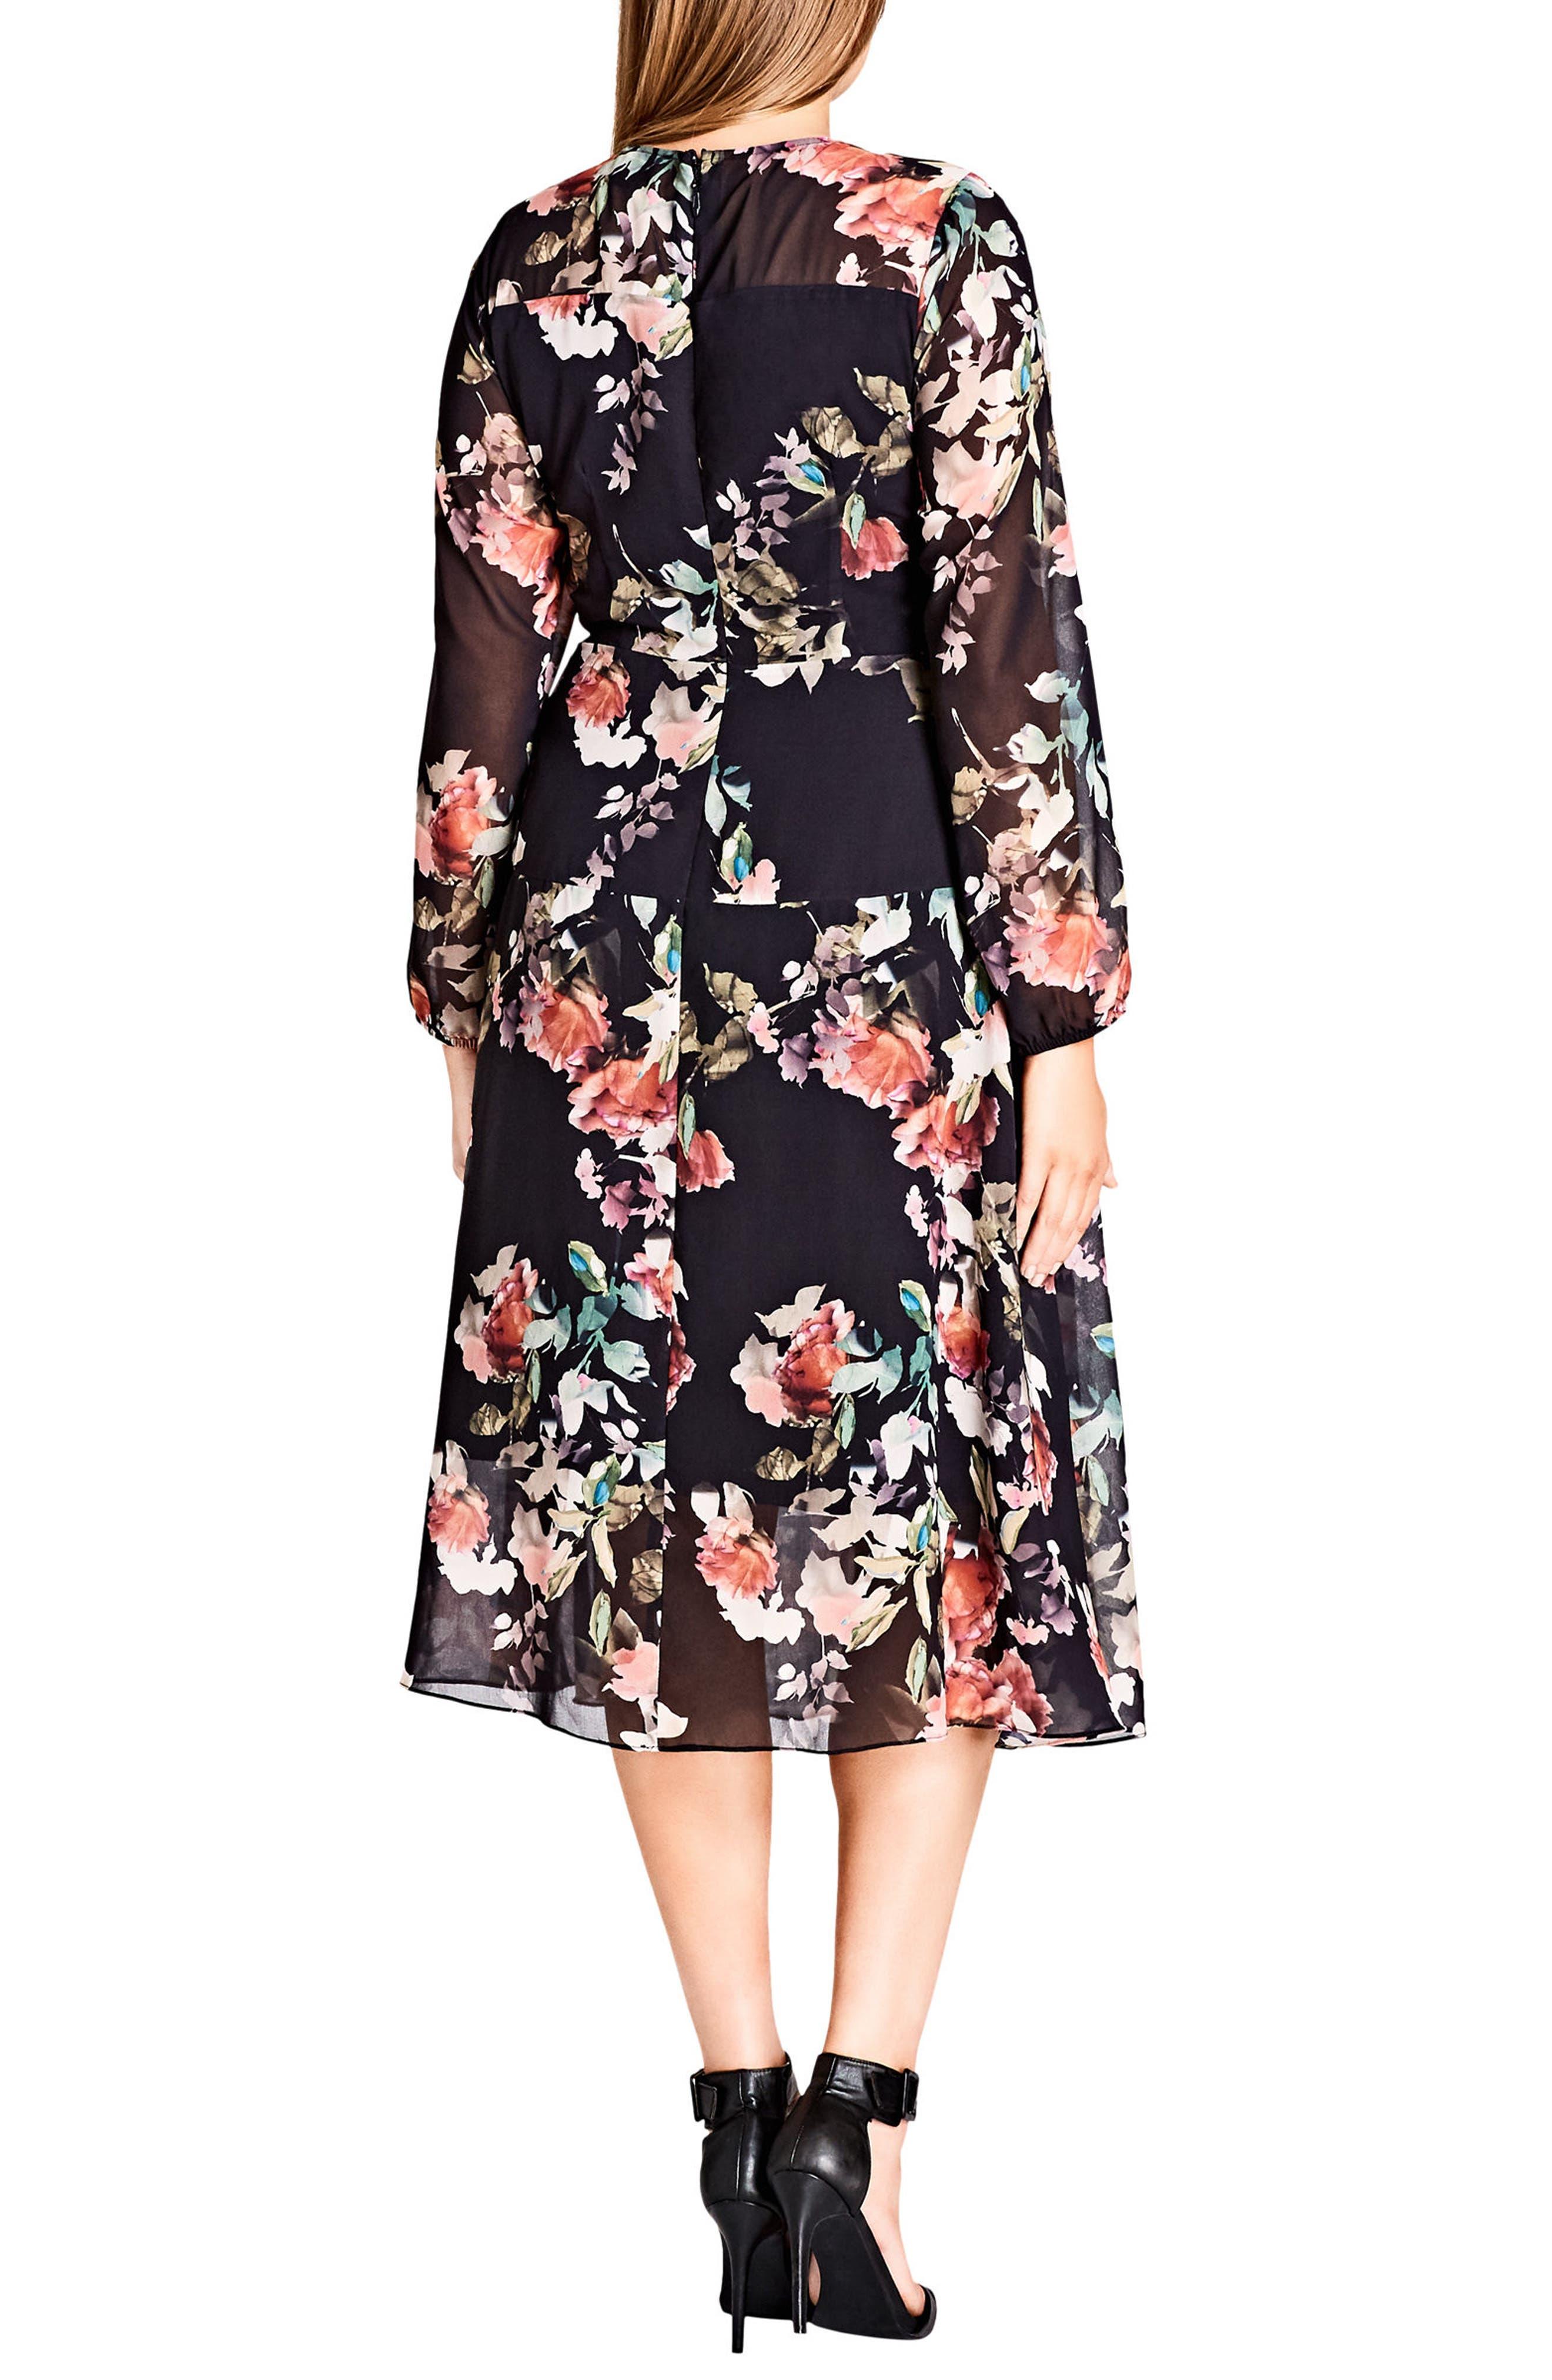 Sheer Divine Floral Print Midi Dress,                             Alternate thumbnail 2, color,                             001